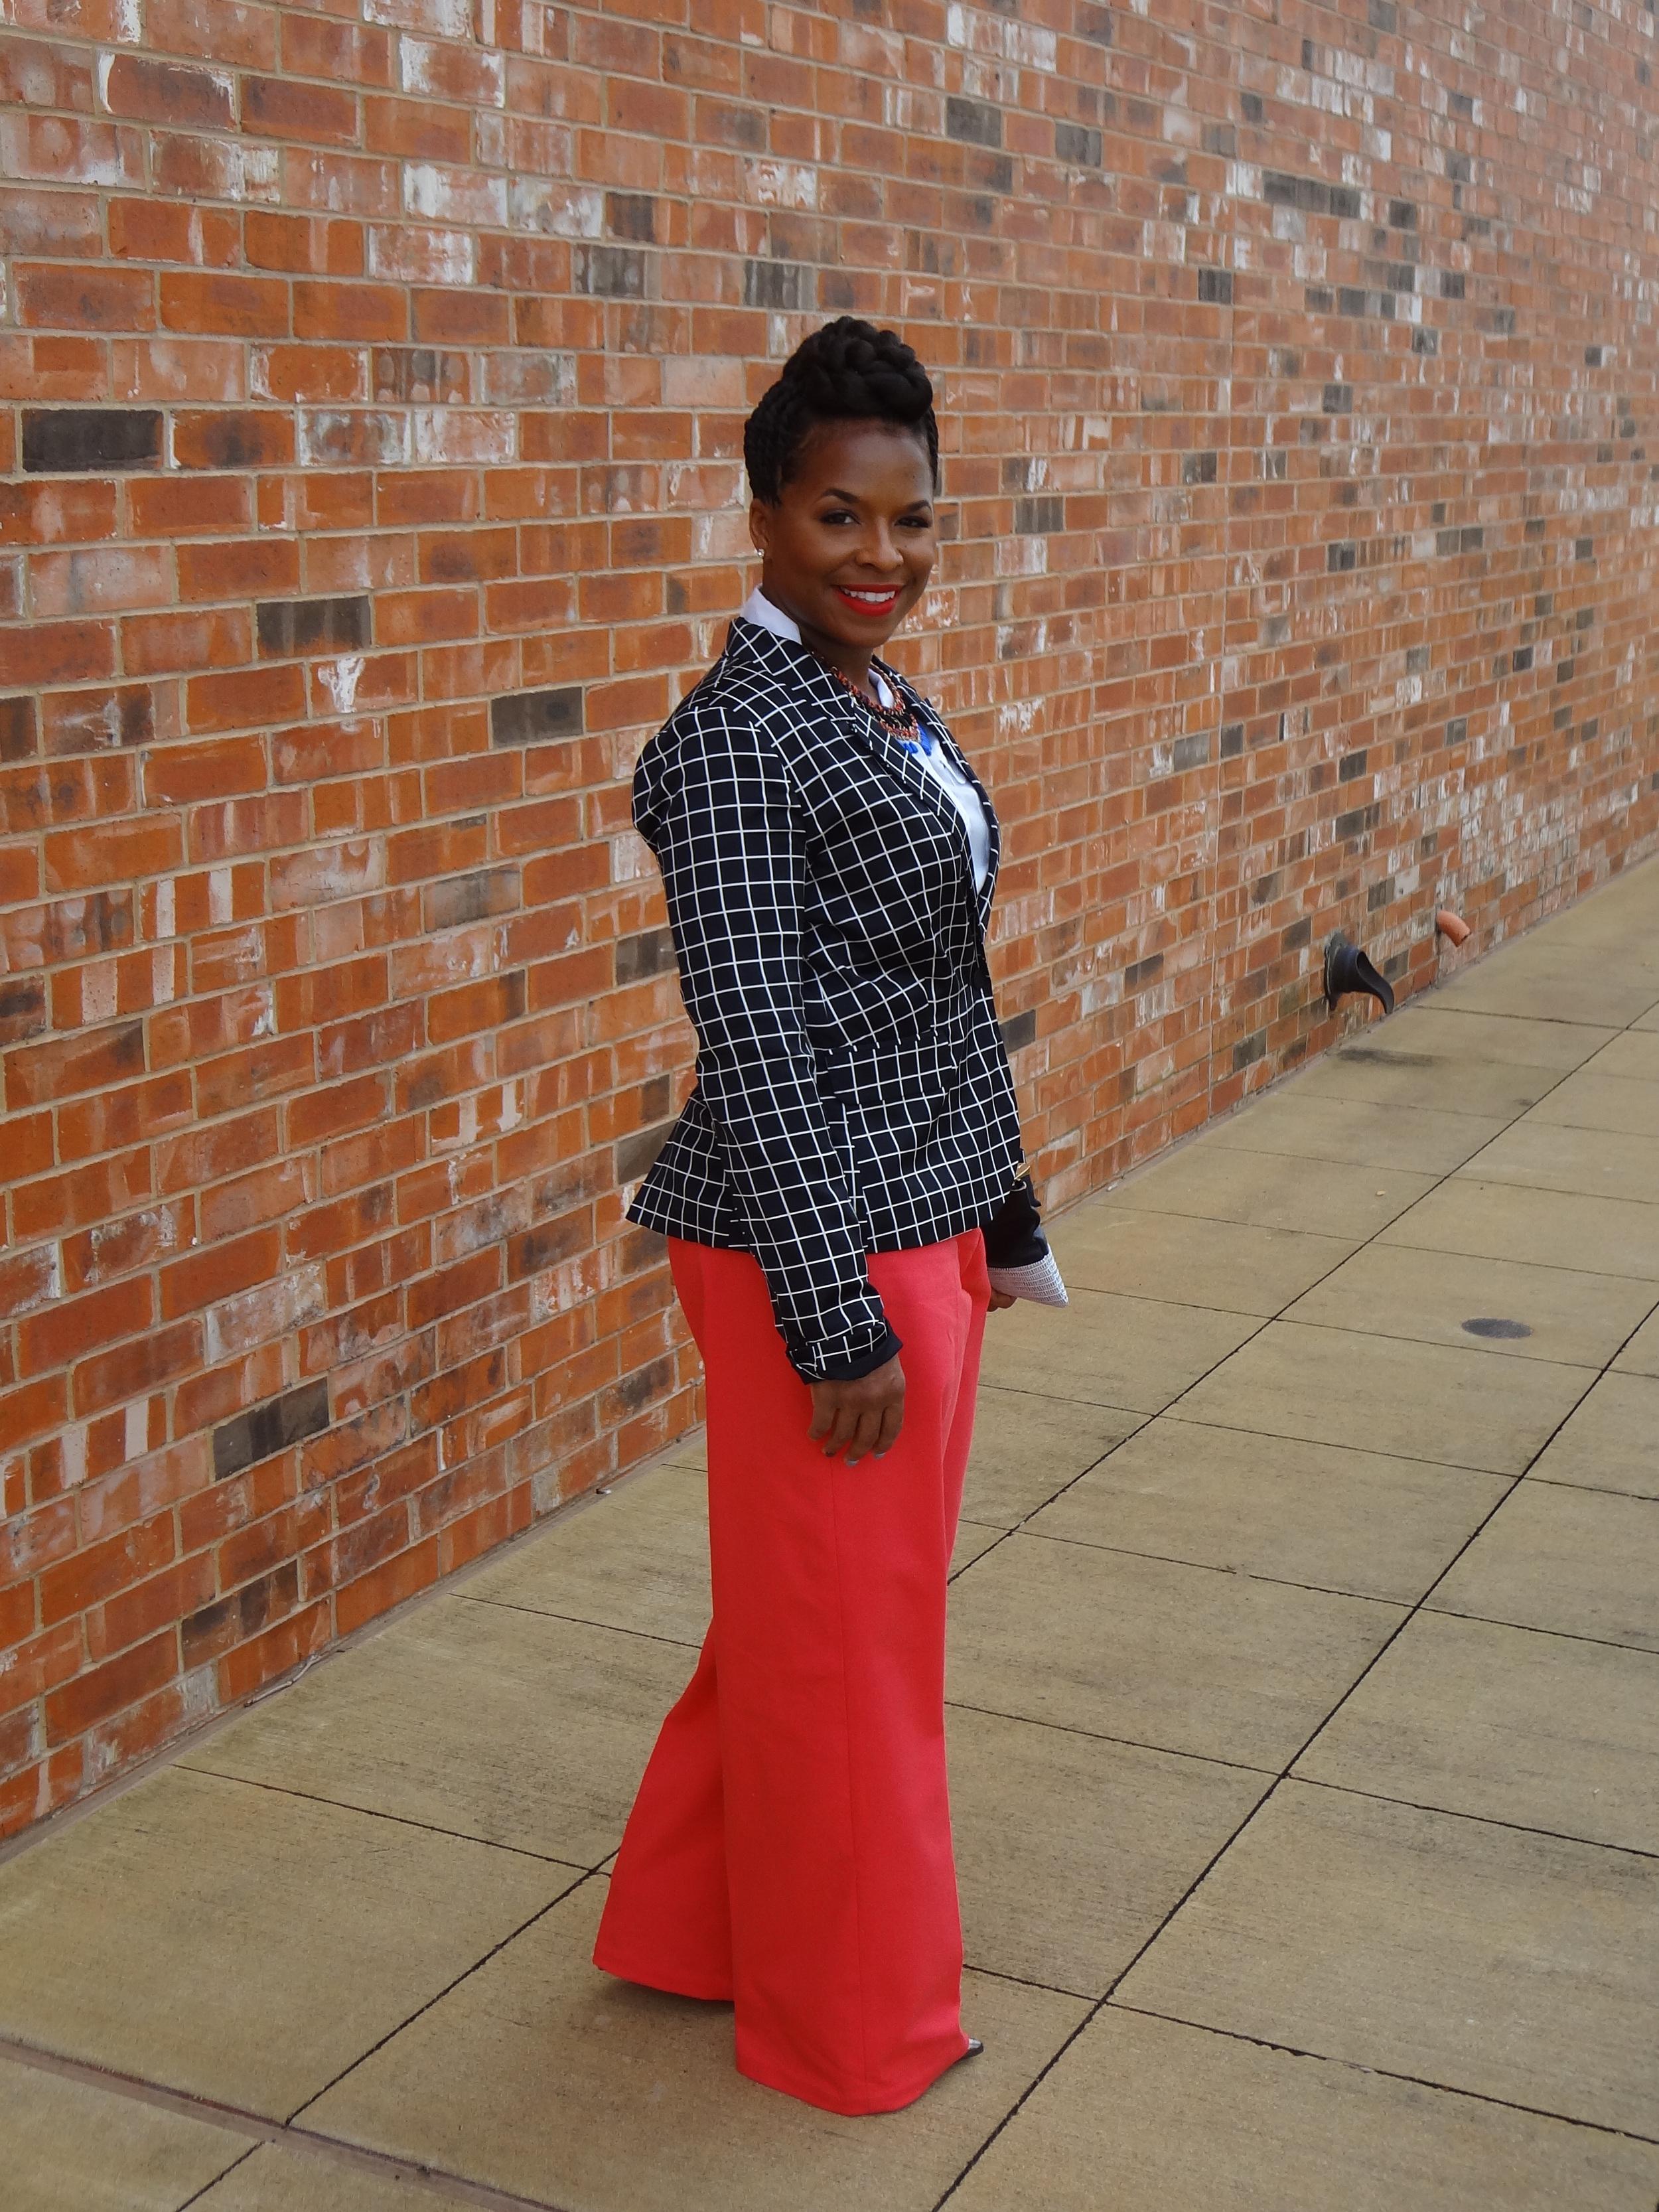 DIY High Waist pants, http://www.3degreesdb.com/3degreesdb-three-generations-blog/2014/3/23/strawberry-red-pants